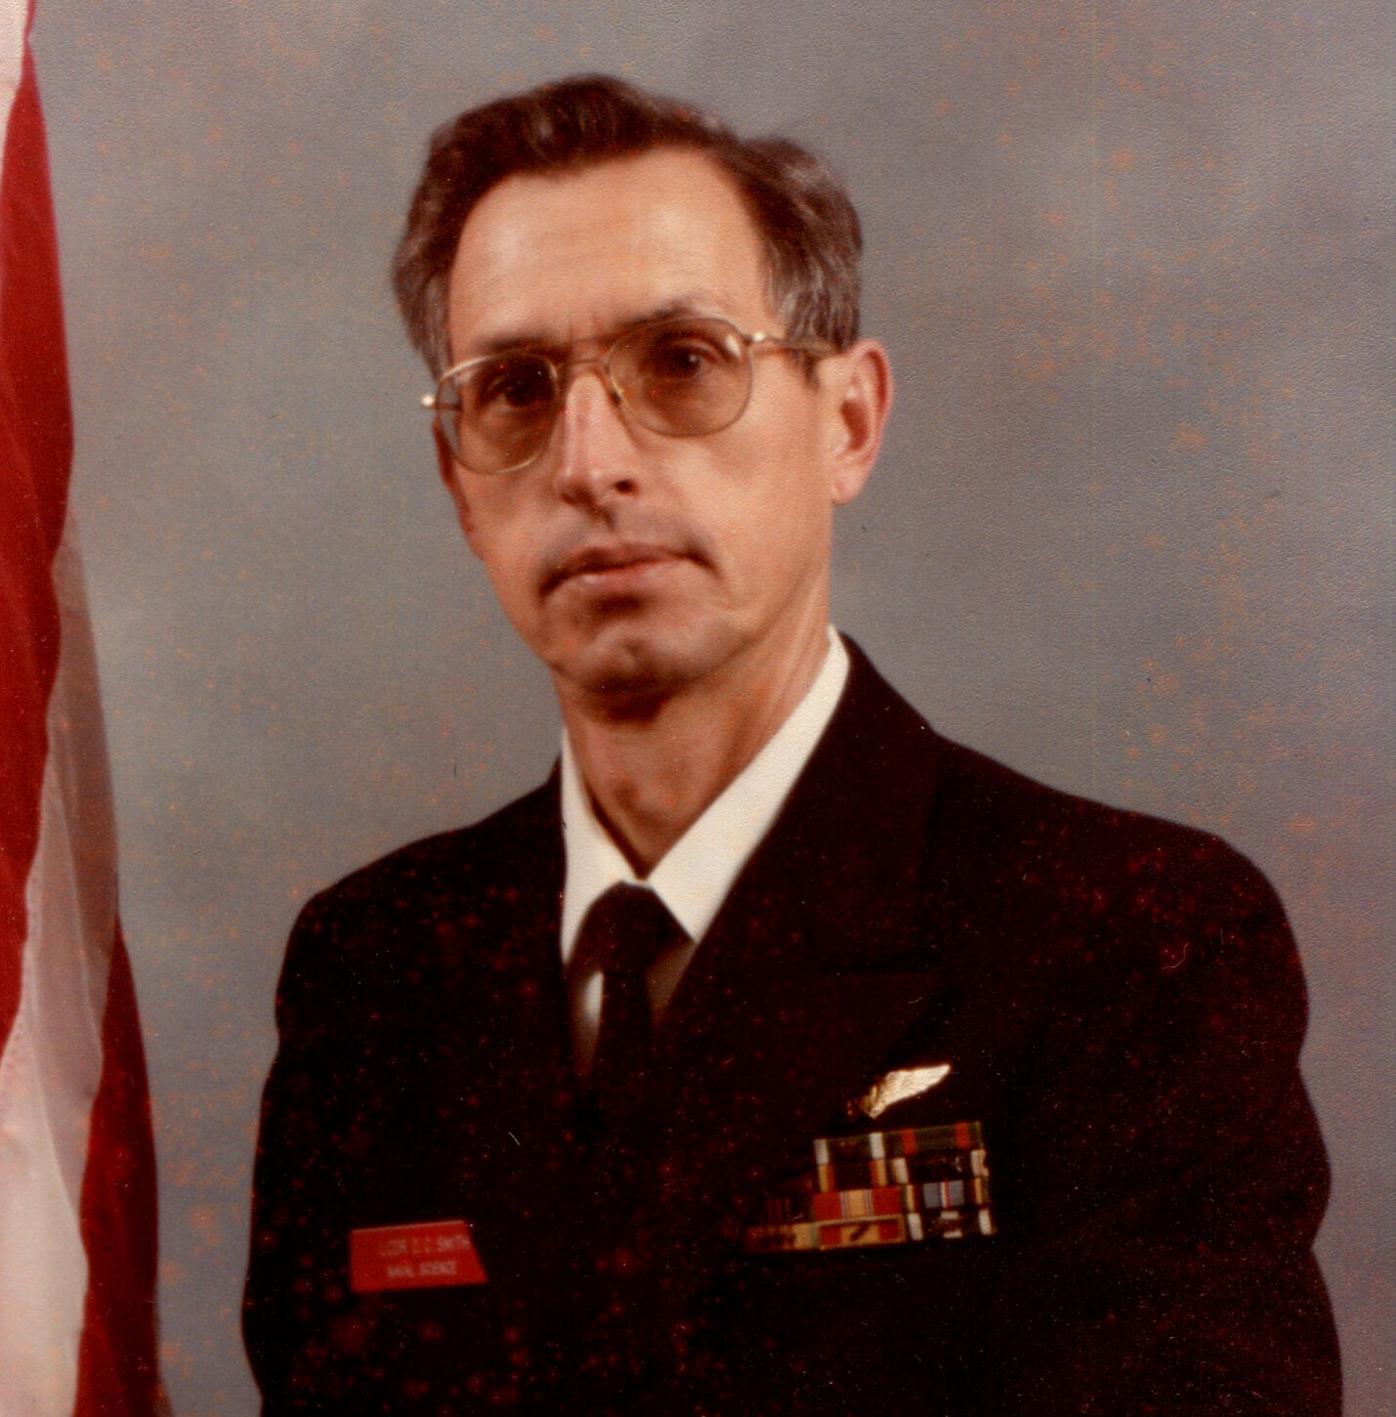 Lt. Commander David C. Smith